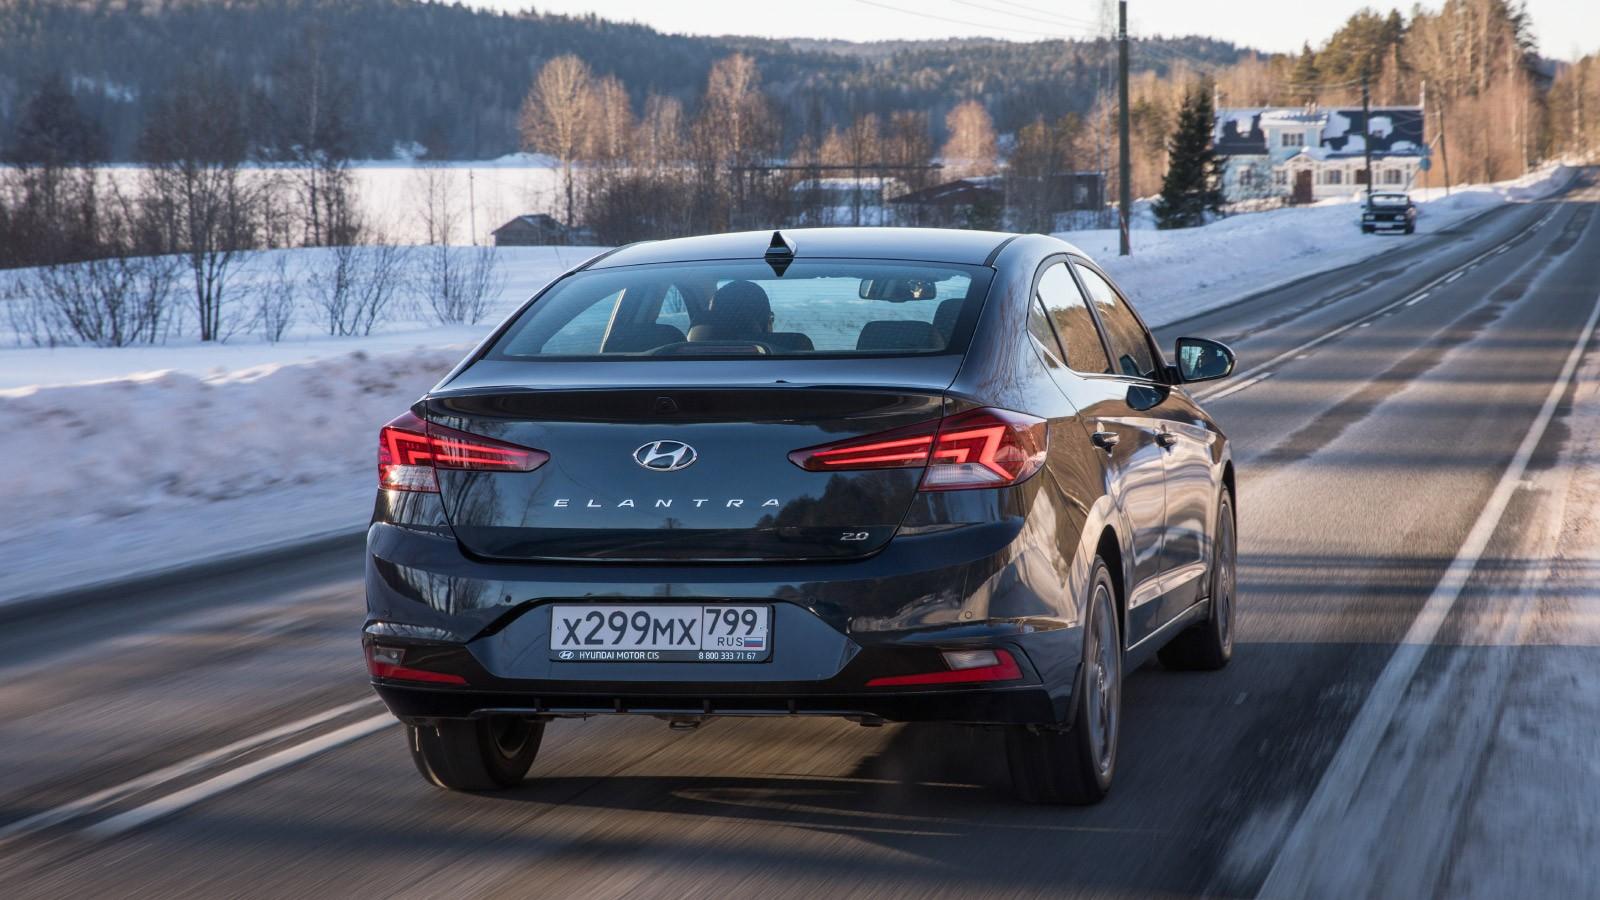 Hyundai_Elantra_dynamics-32